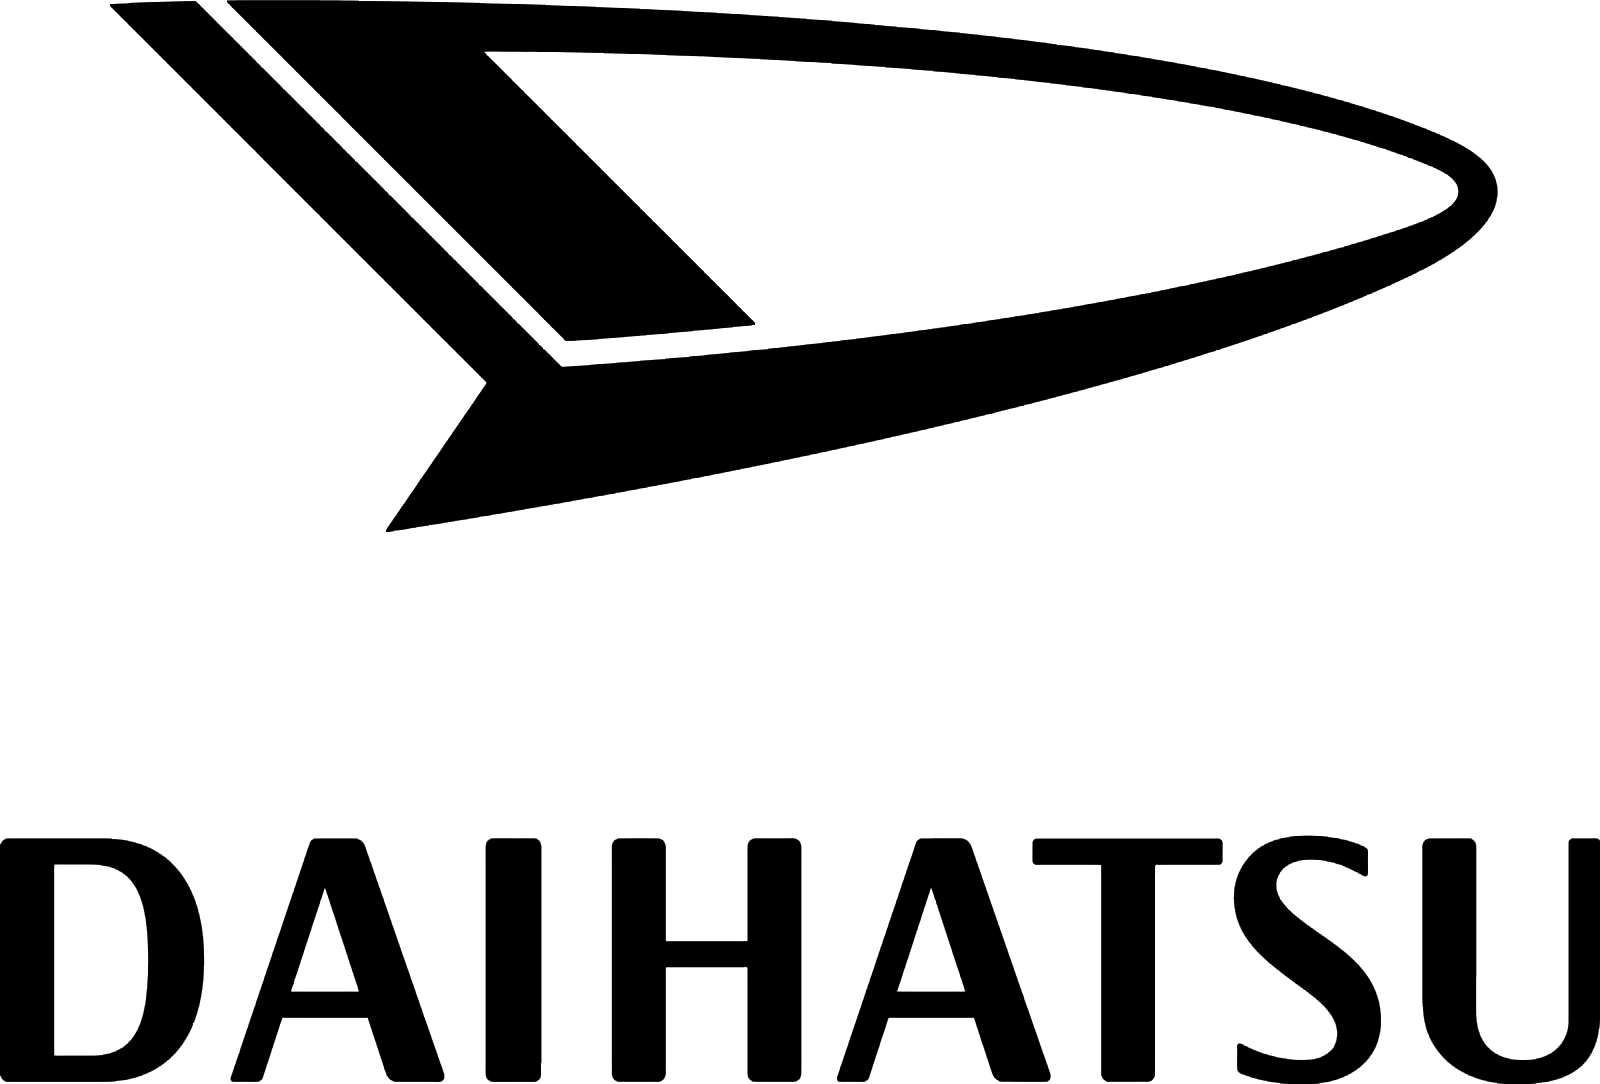 Daihatsu Service Manuals Free